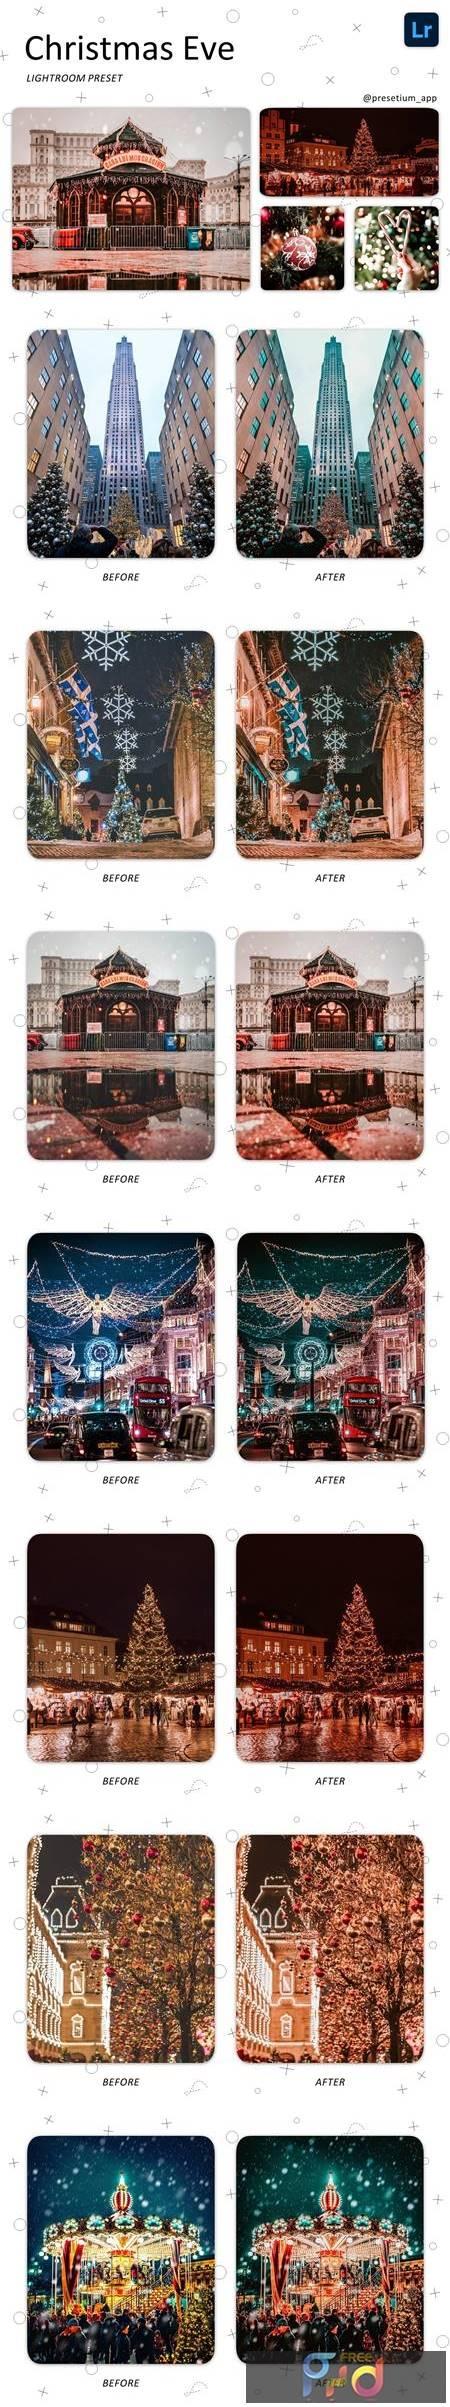 Christmas Eve - Lightroom Presets 5223772 1